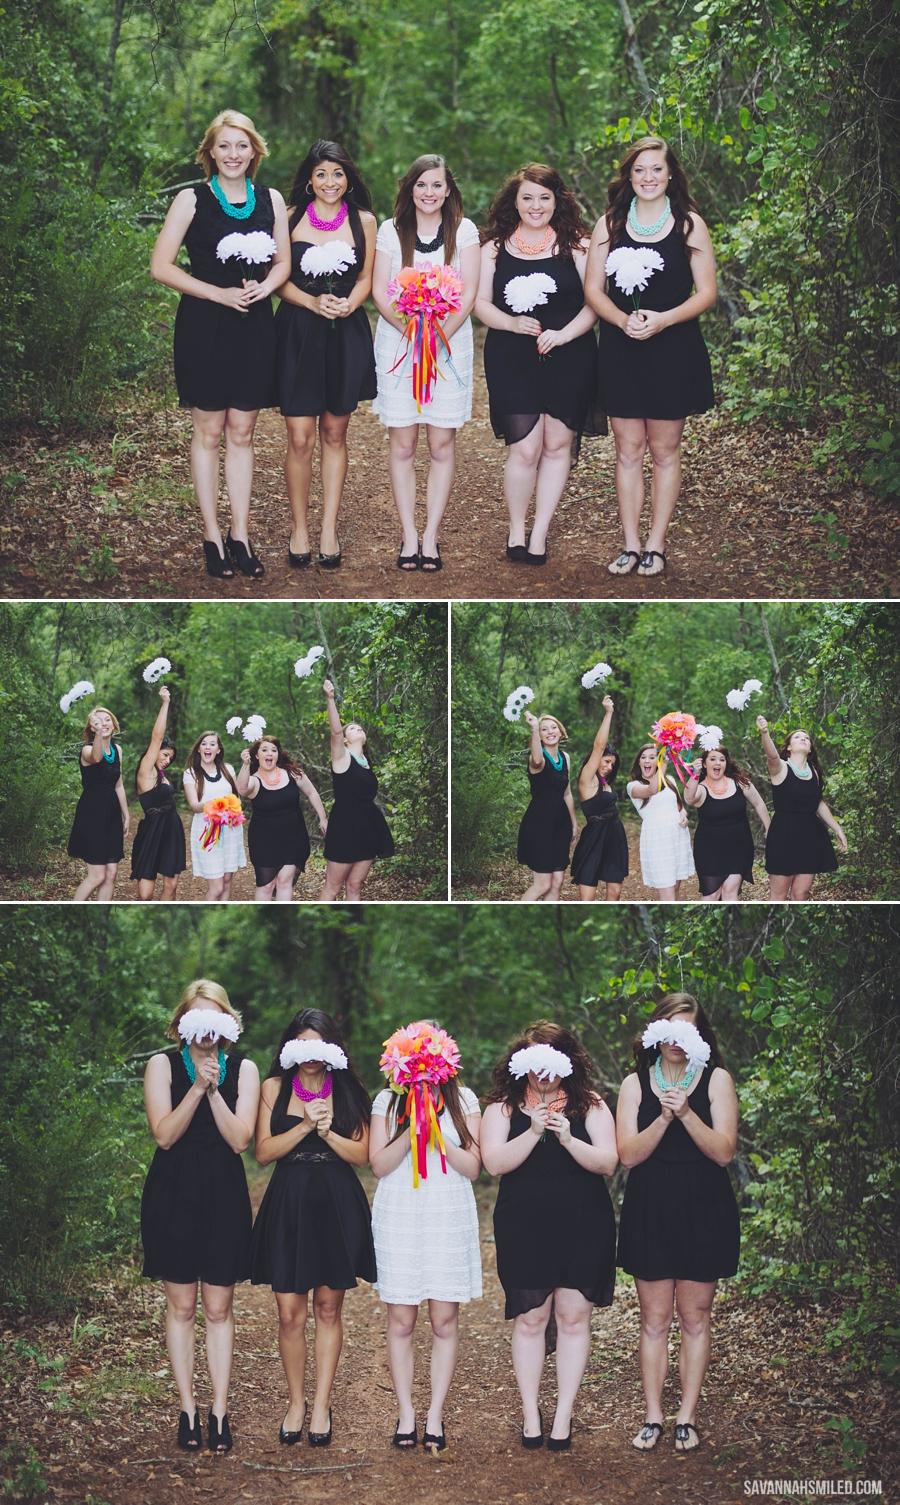 bridesmaids-photo-shoot-8.jpg